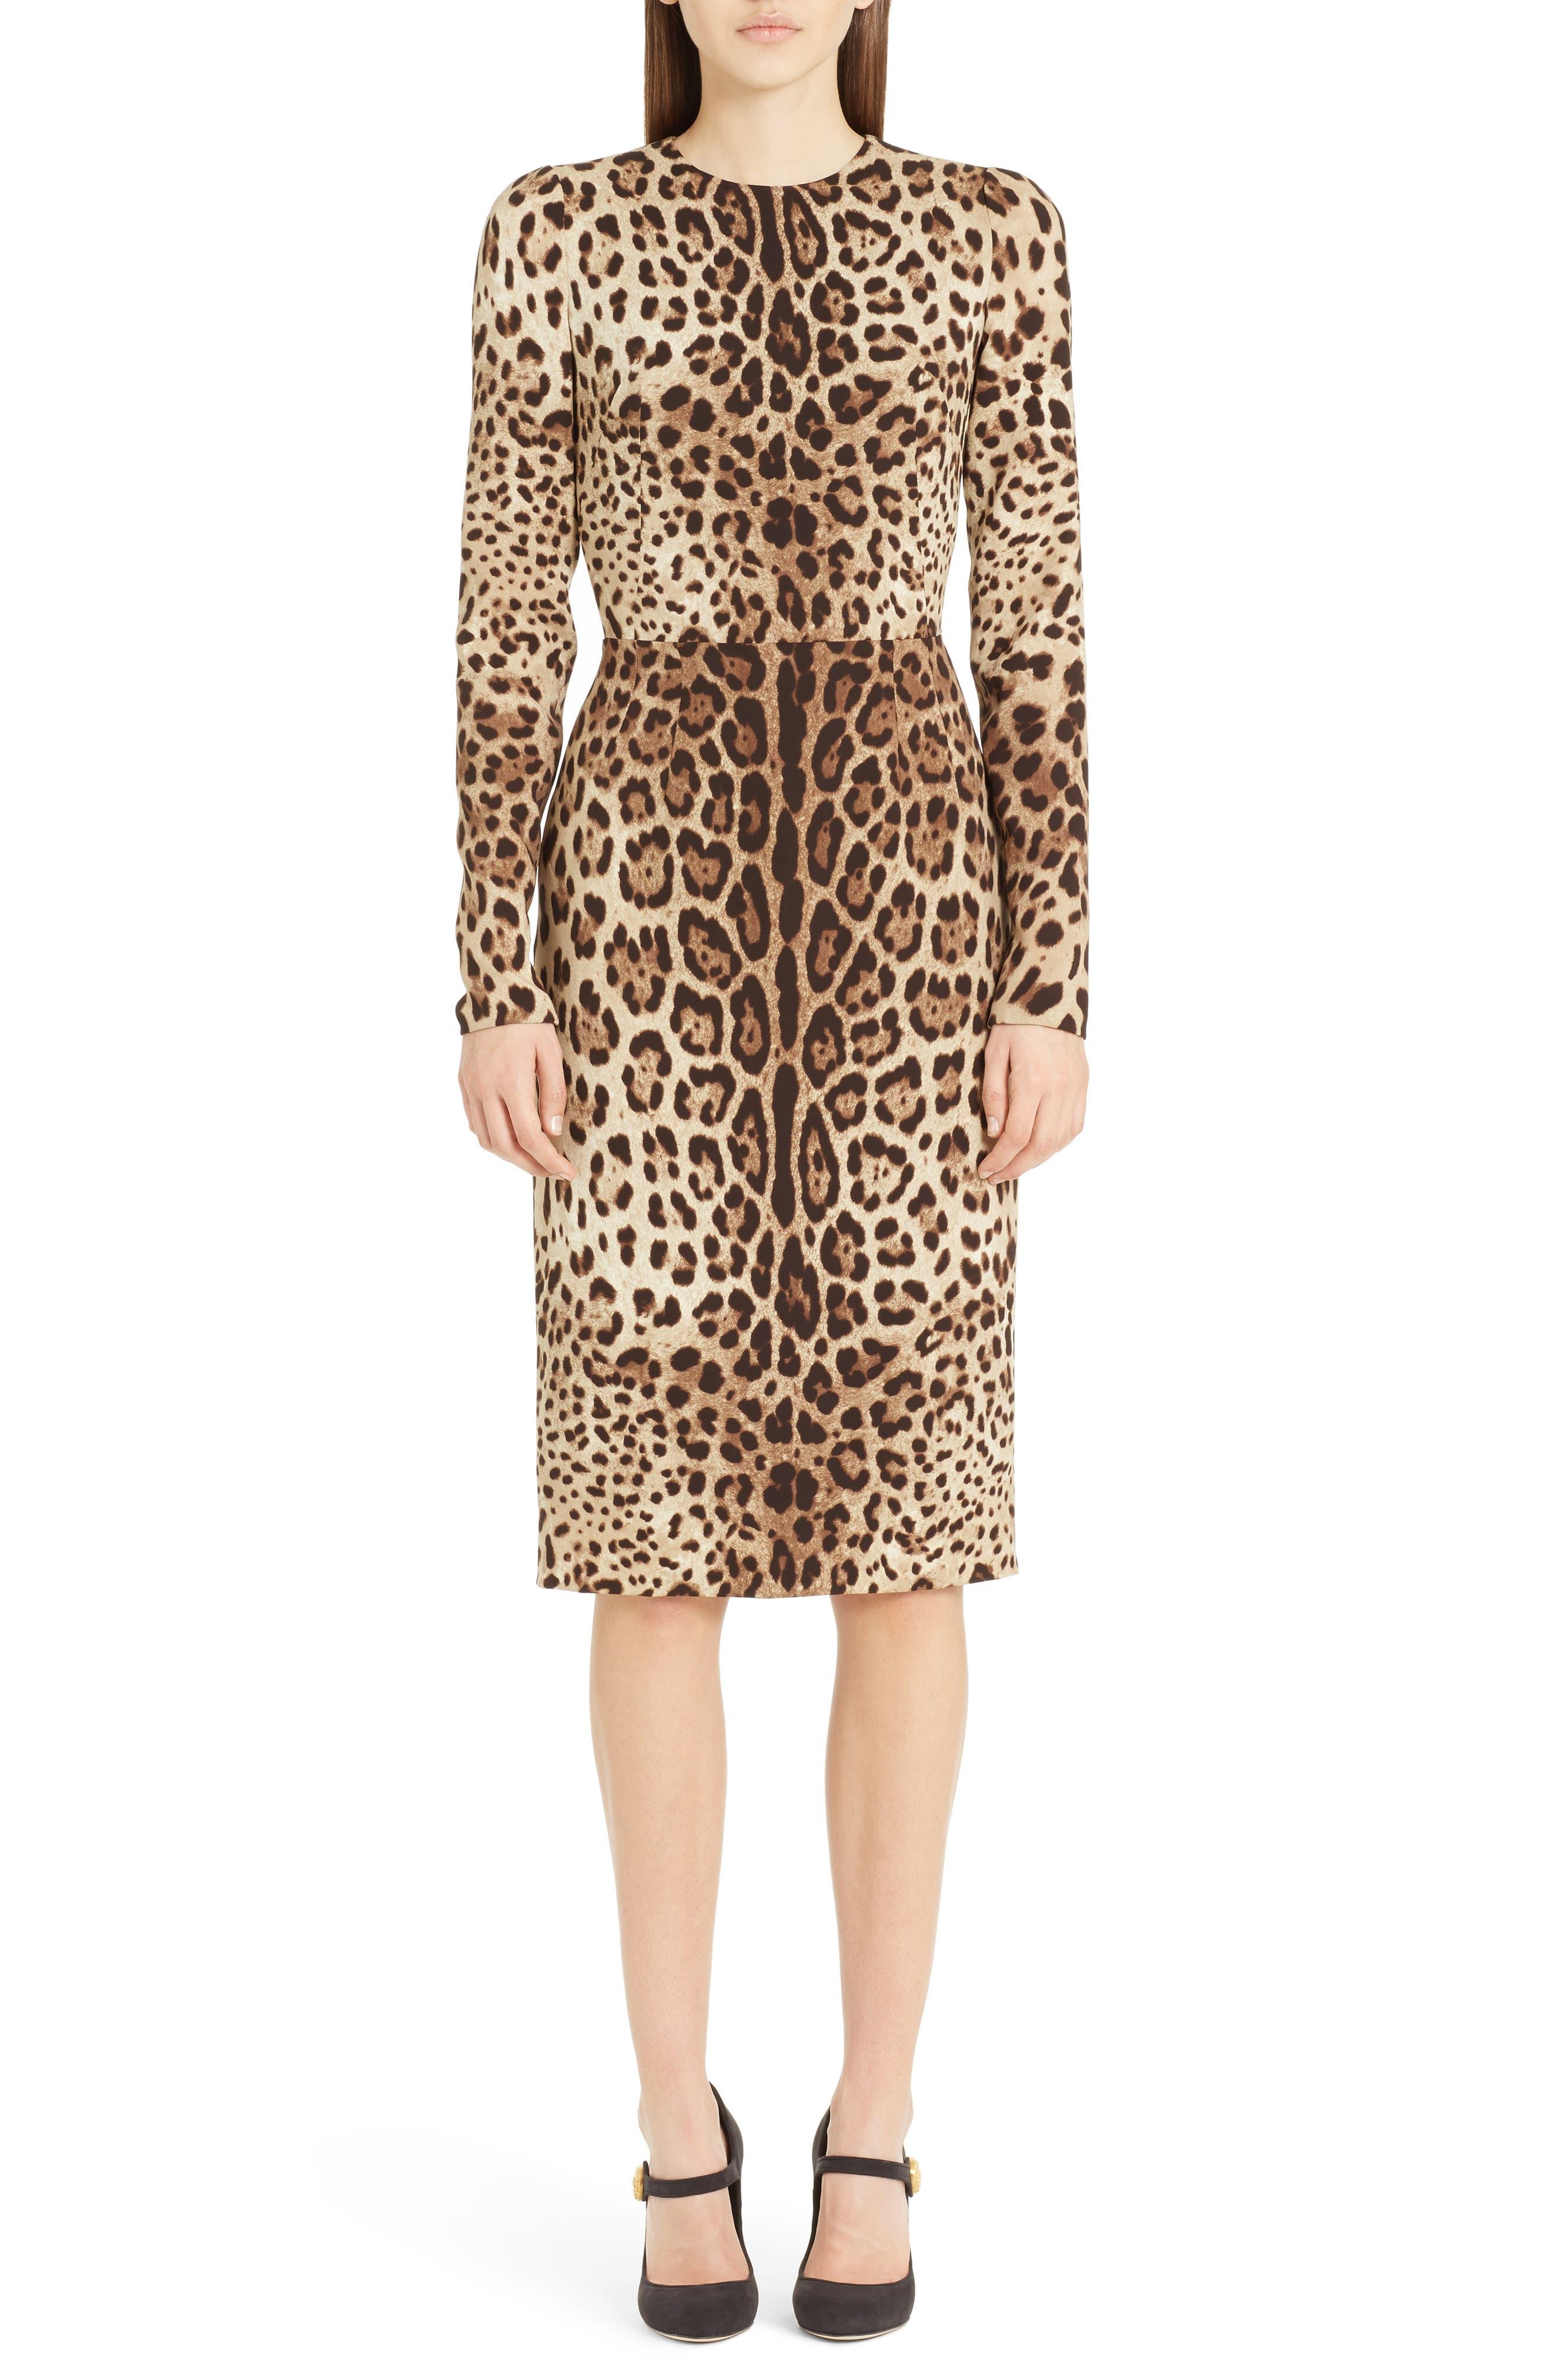 Dolce & gabbana Leopard Print Stretch Silk Sheath Dress